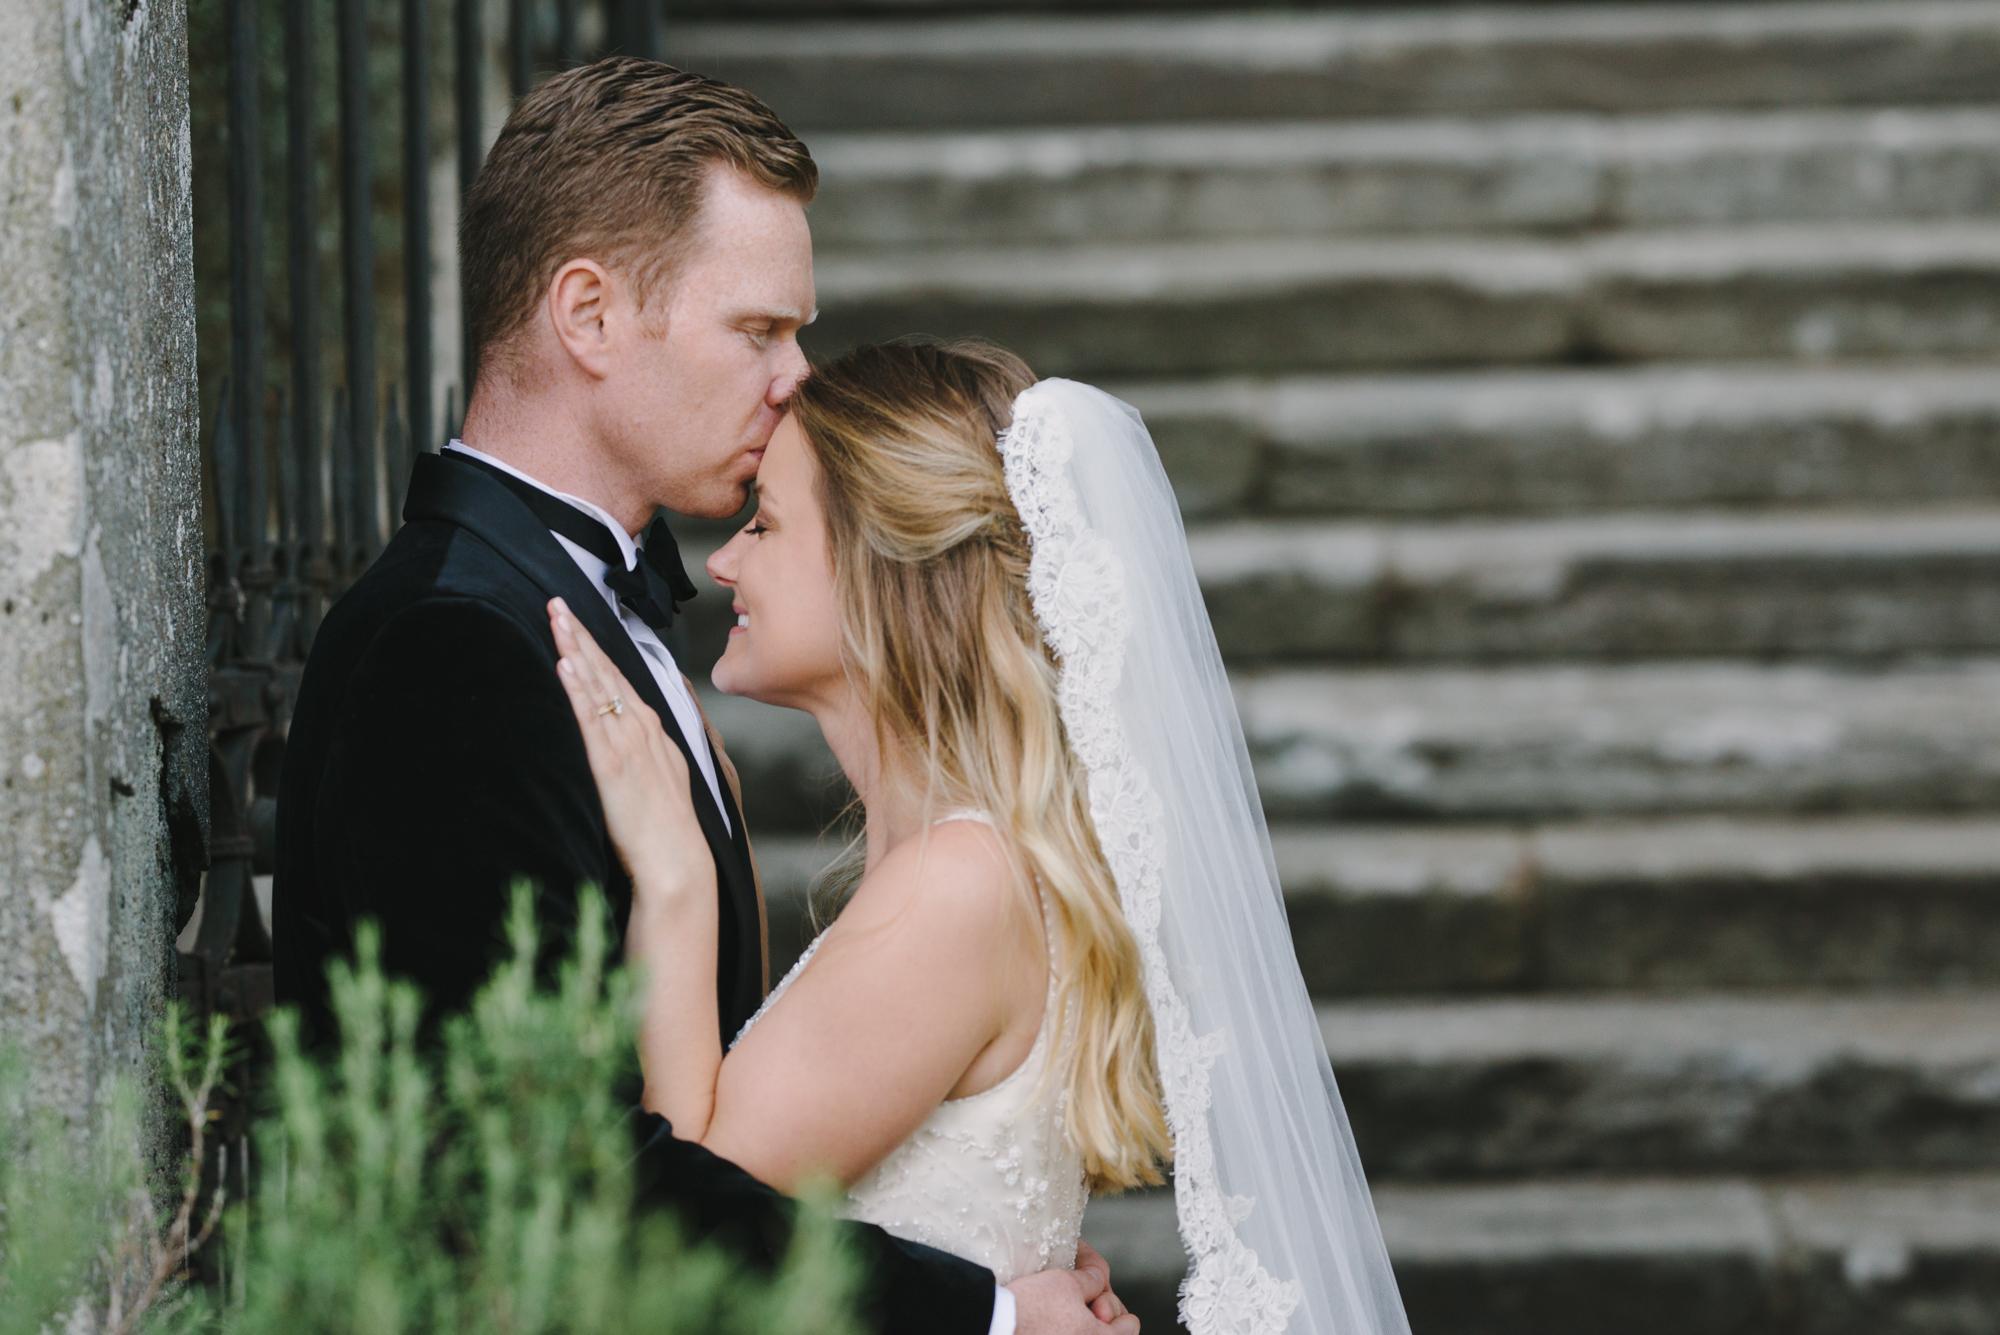 Wedding_Photographer_in_Tuscany_Italy-014.jpg